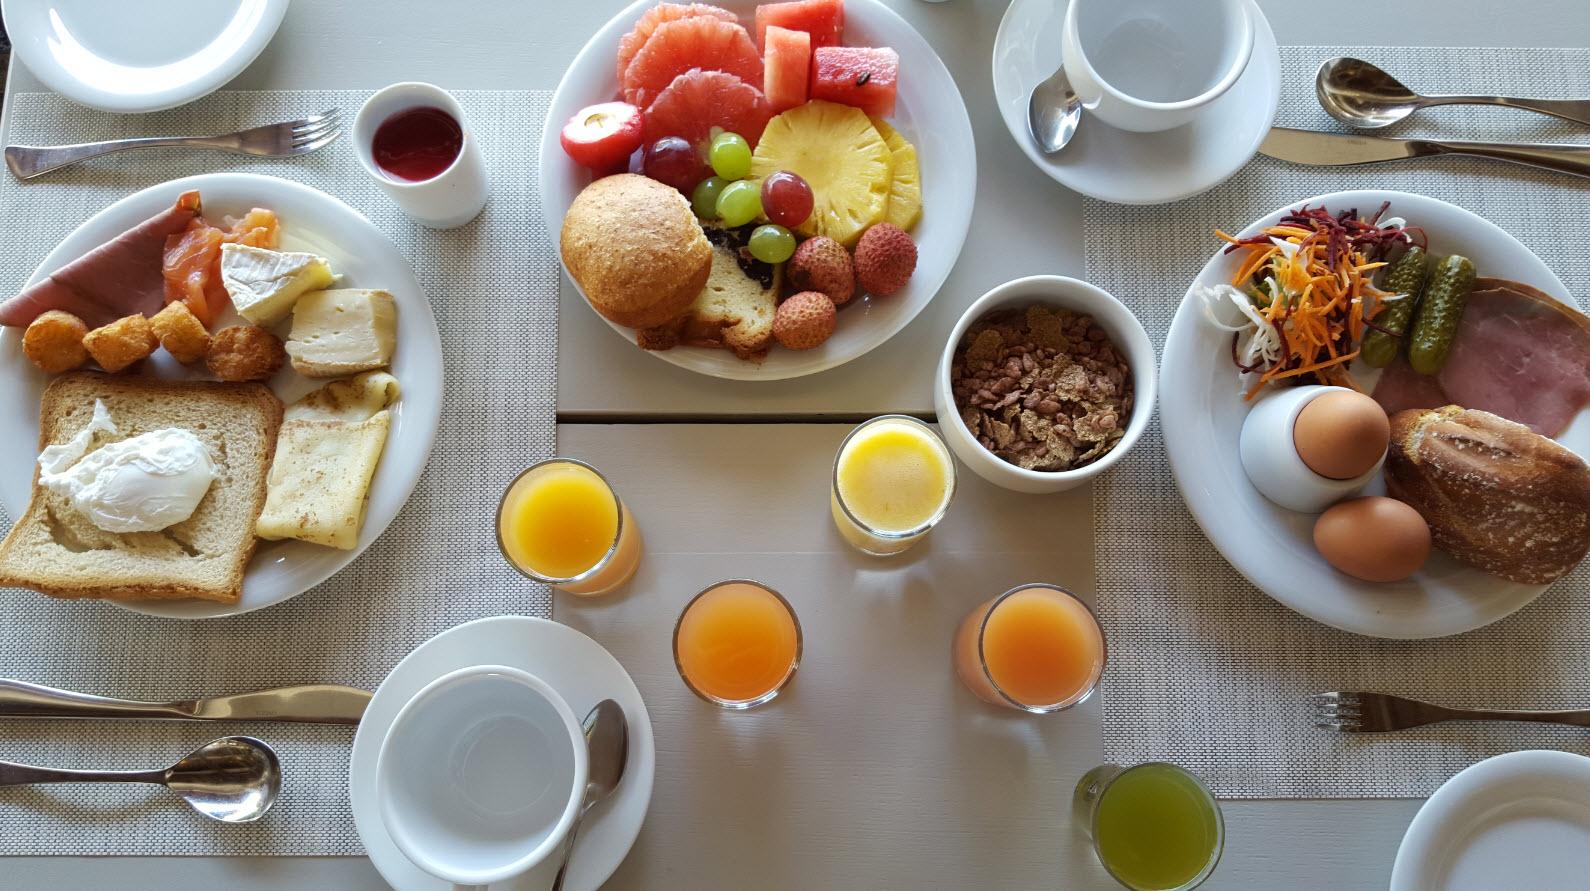 Bon petit-dejeuner